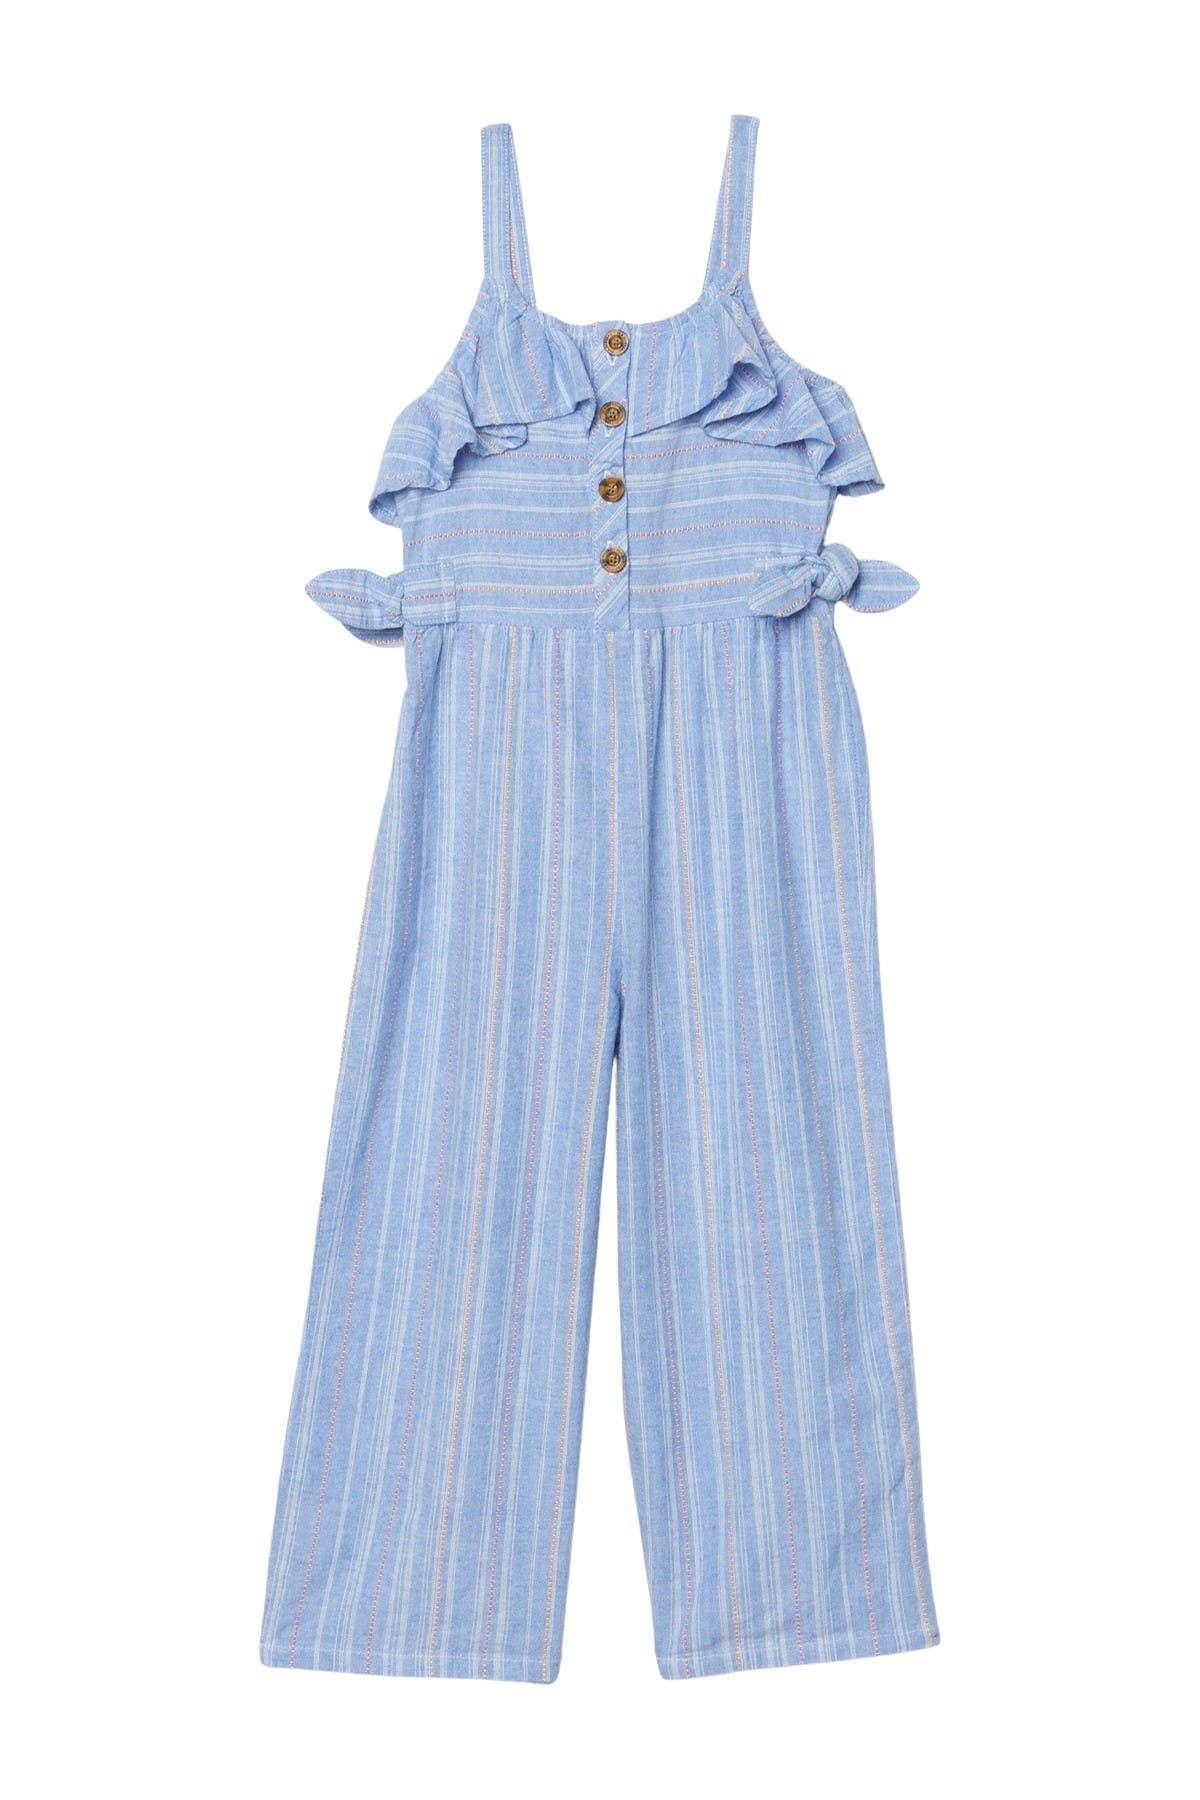 Image of Habitual Kids Stripe Cotton Jumpsuit